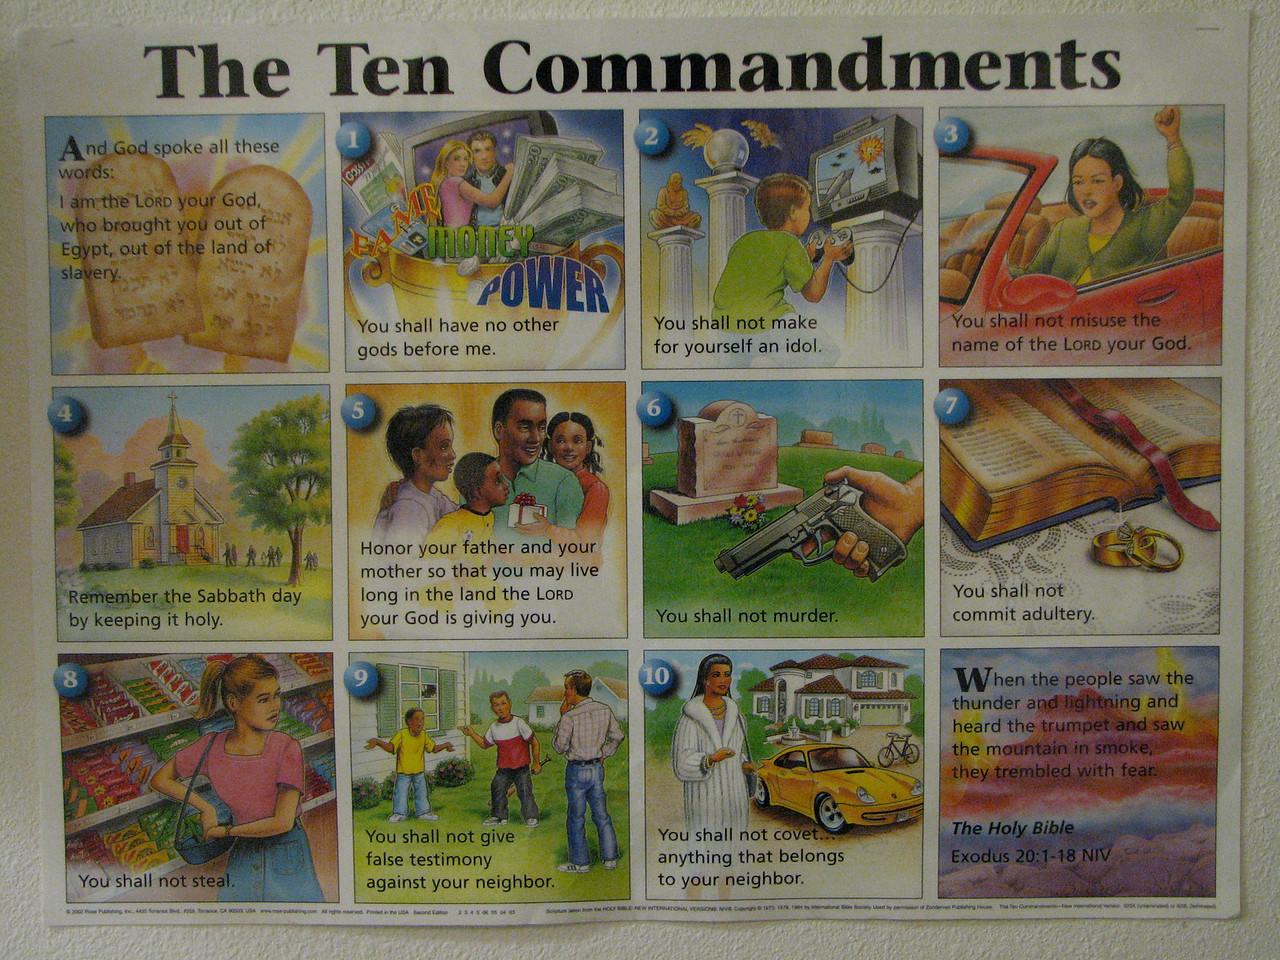 2007 04 13 Fri - Christ EV Free - Hilar 10 Commandments poster